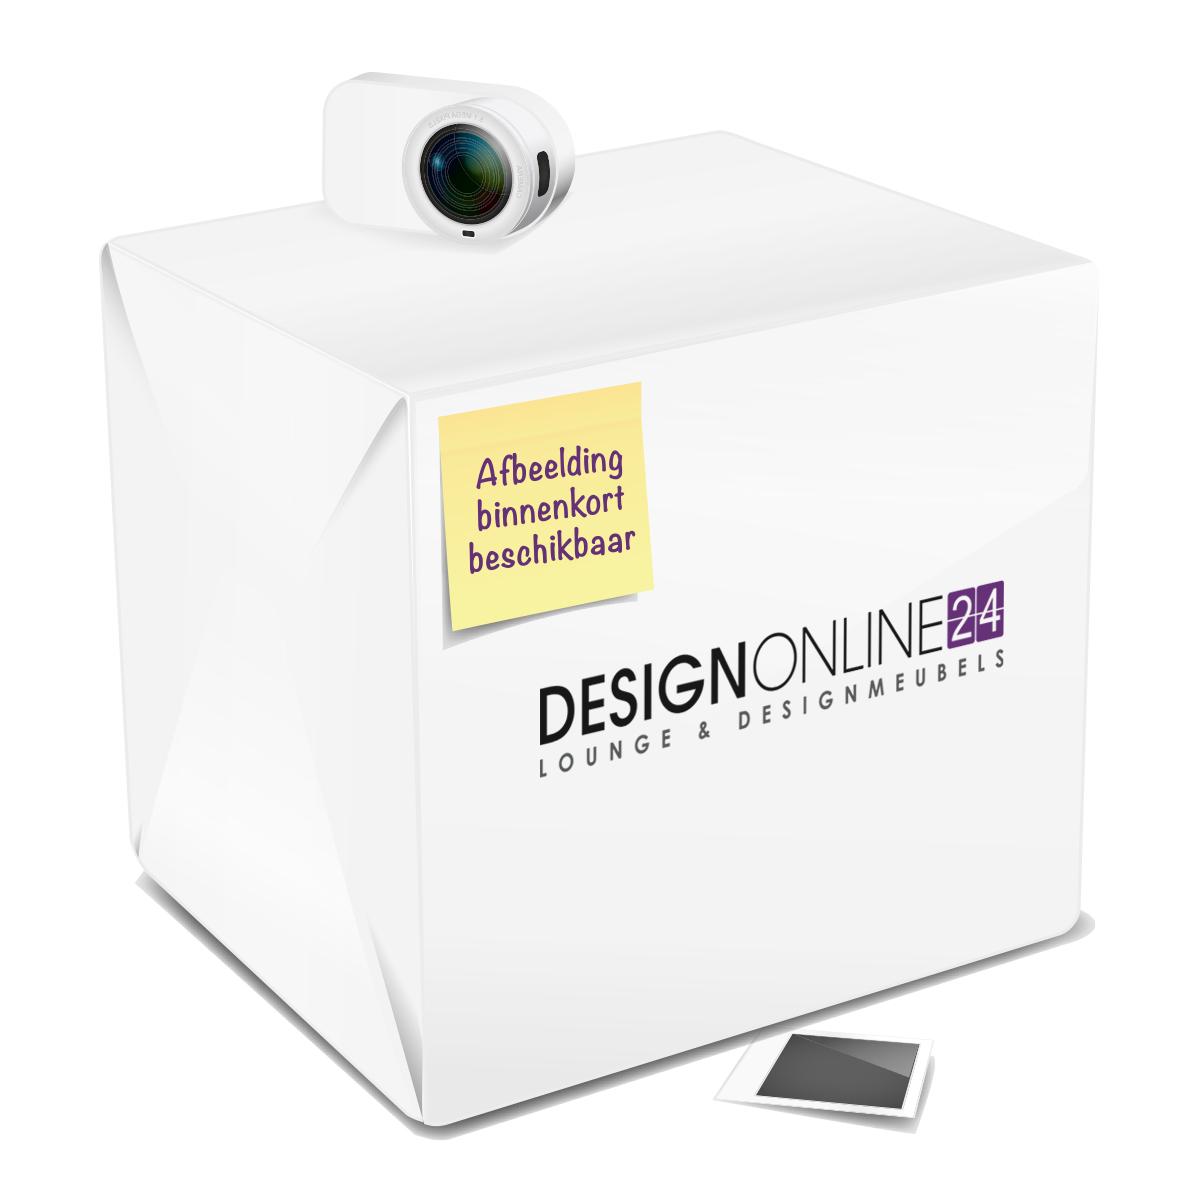 24Designs Gamestoel & Bureaustoel - mcRacing Pro 8 - PU Leder - Zwart/Groen